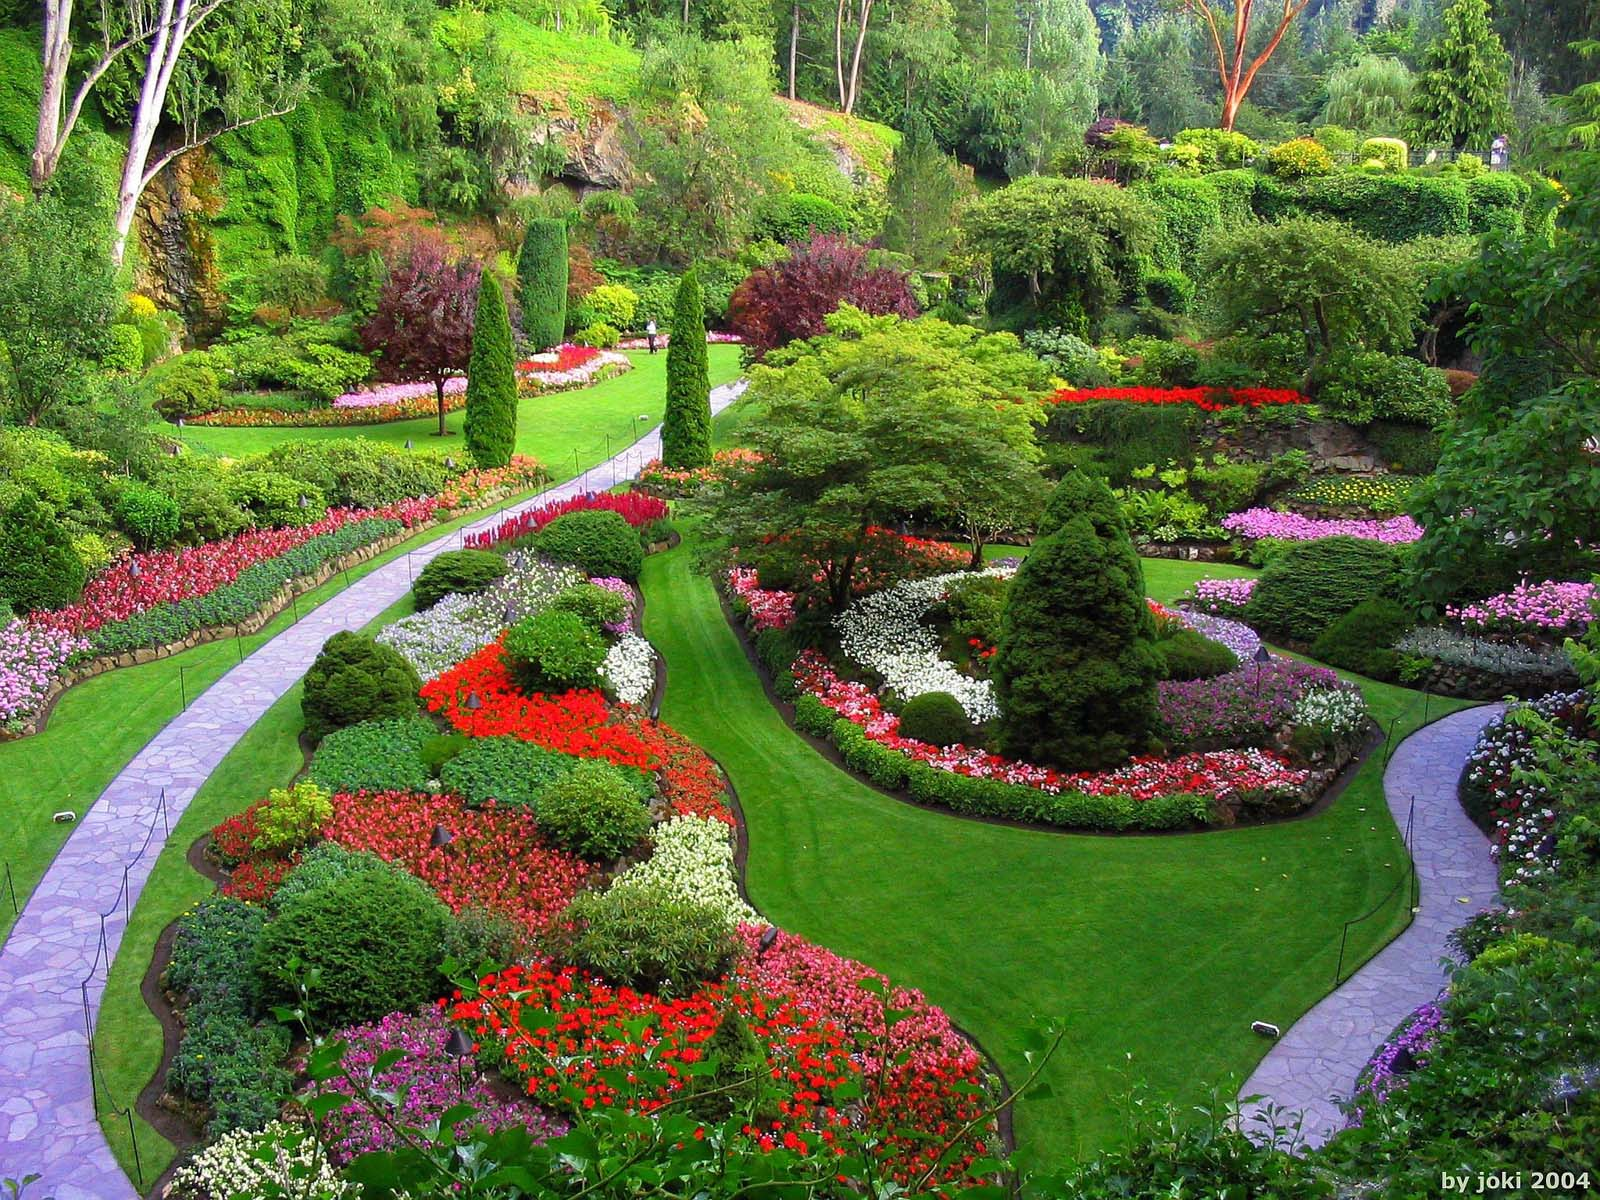 20 Fascinating Backyard Garden Designs - Top Dreamer on Best Yard Design id=62279